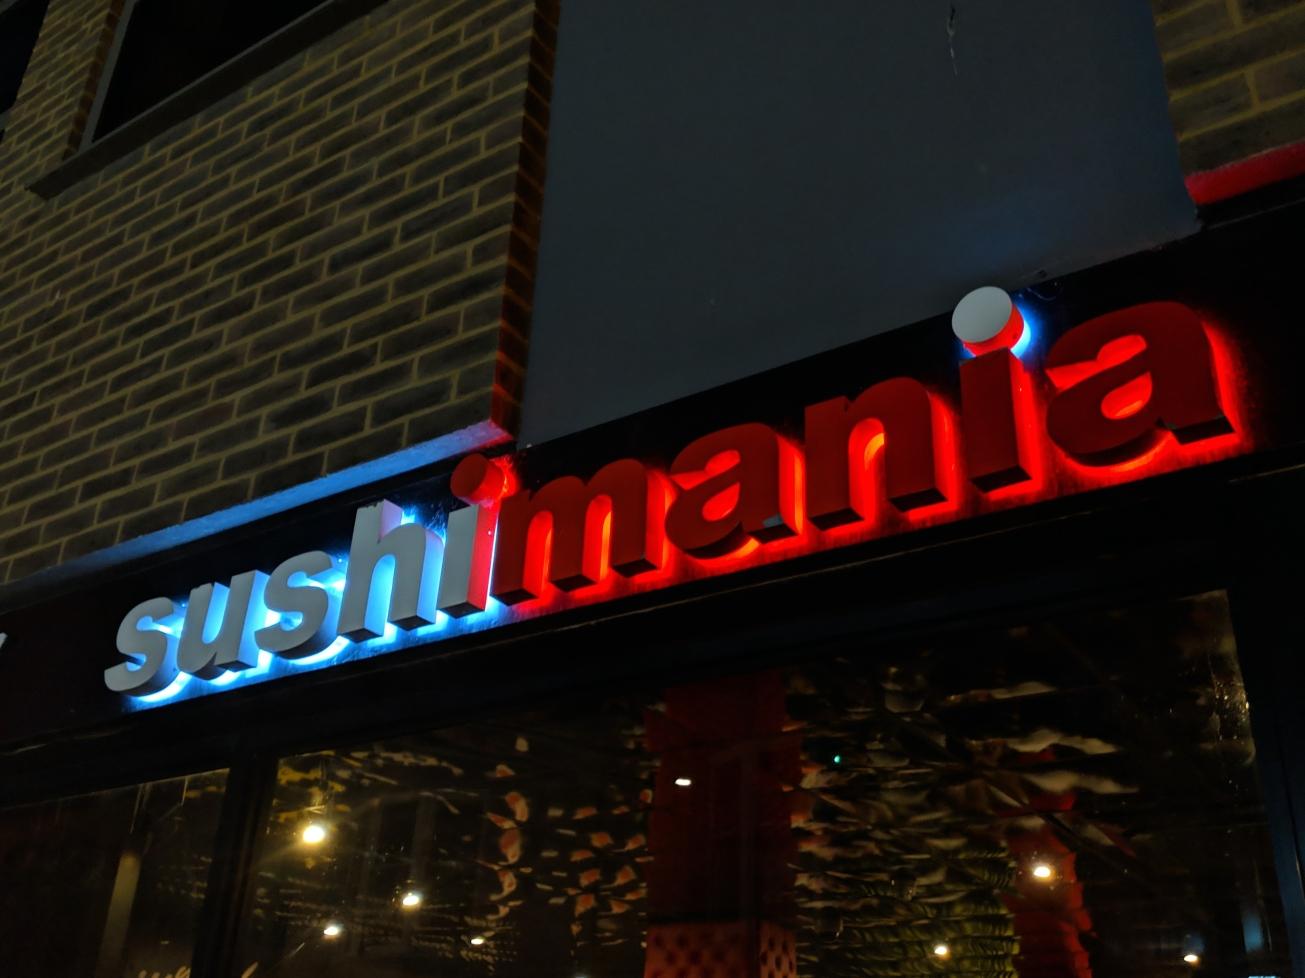 Sushi Mania Brighton Review The Brighton Blogger